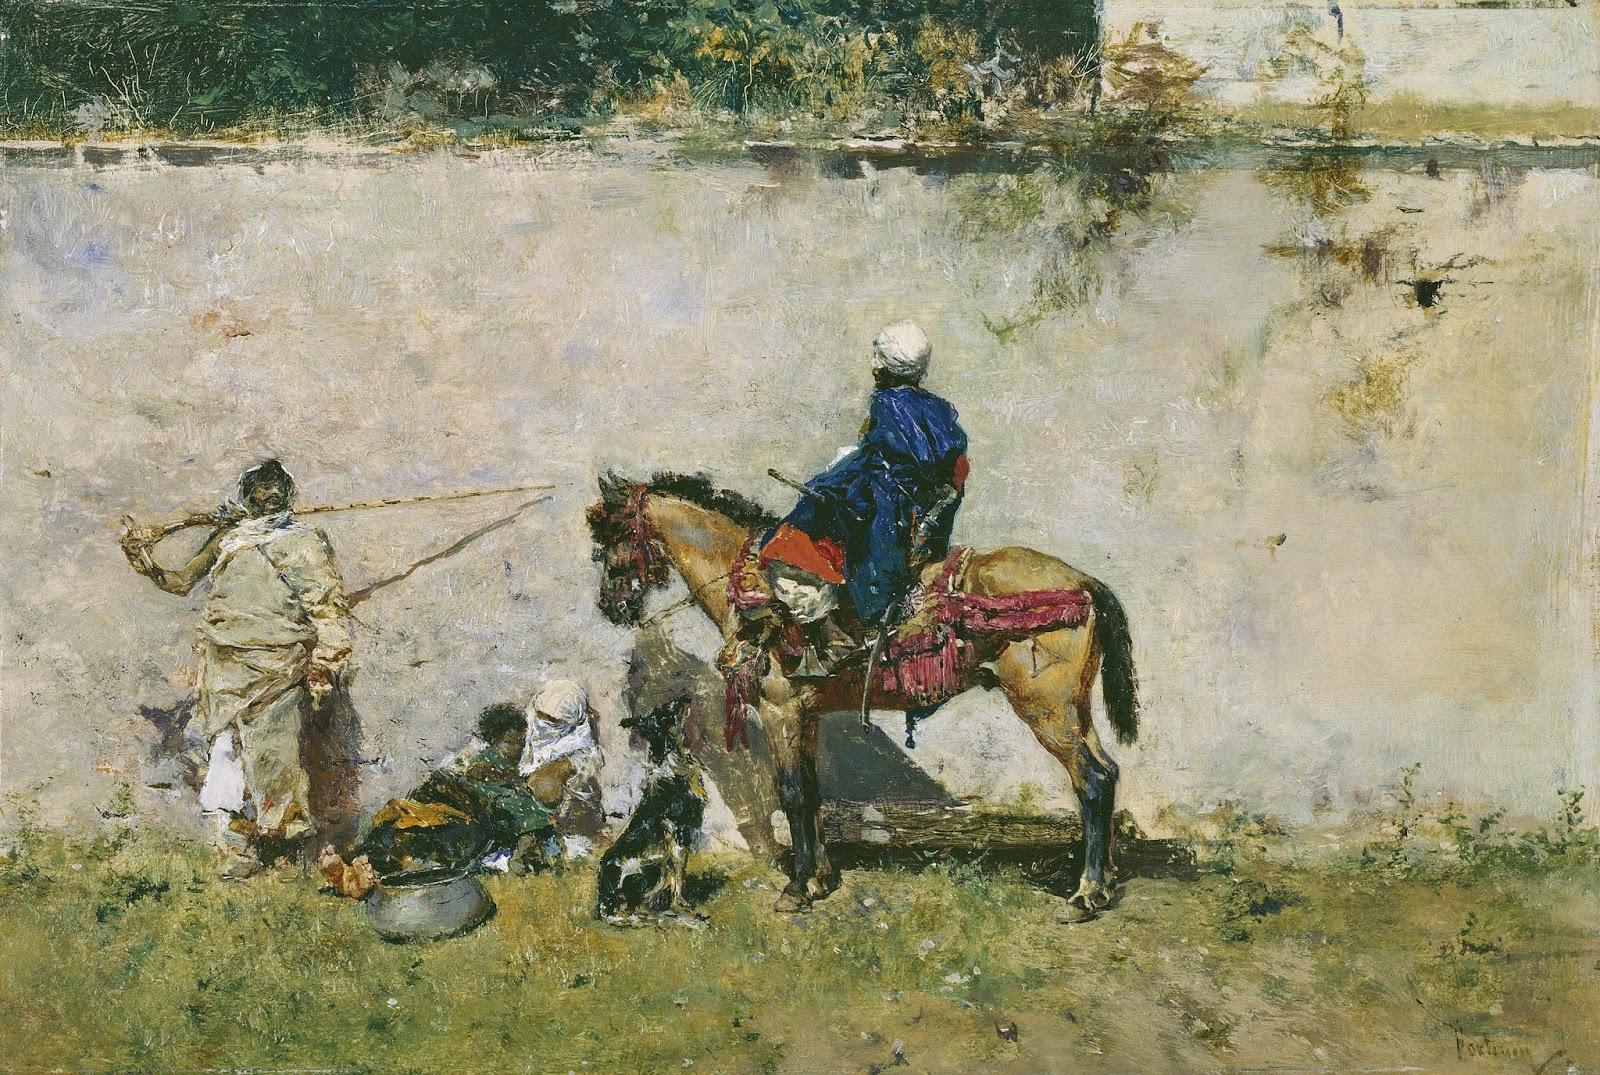 MARIANO FORTUNY Y MARSAL - Marroquinos - Óleo sobre painel - 13 x 19 - Museu do Prado.jpg